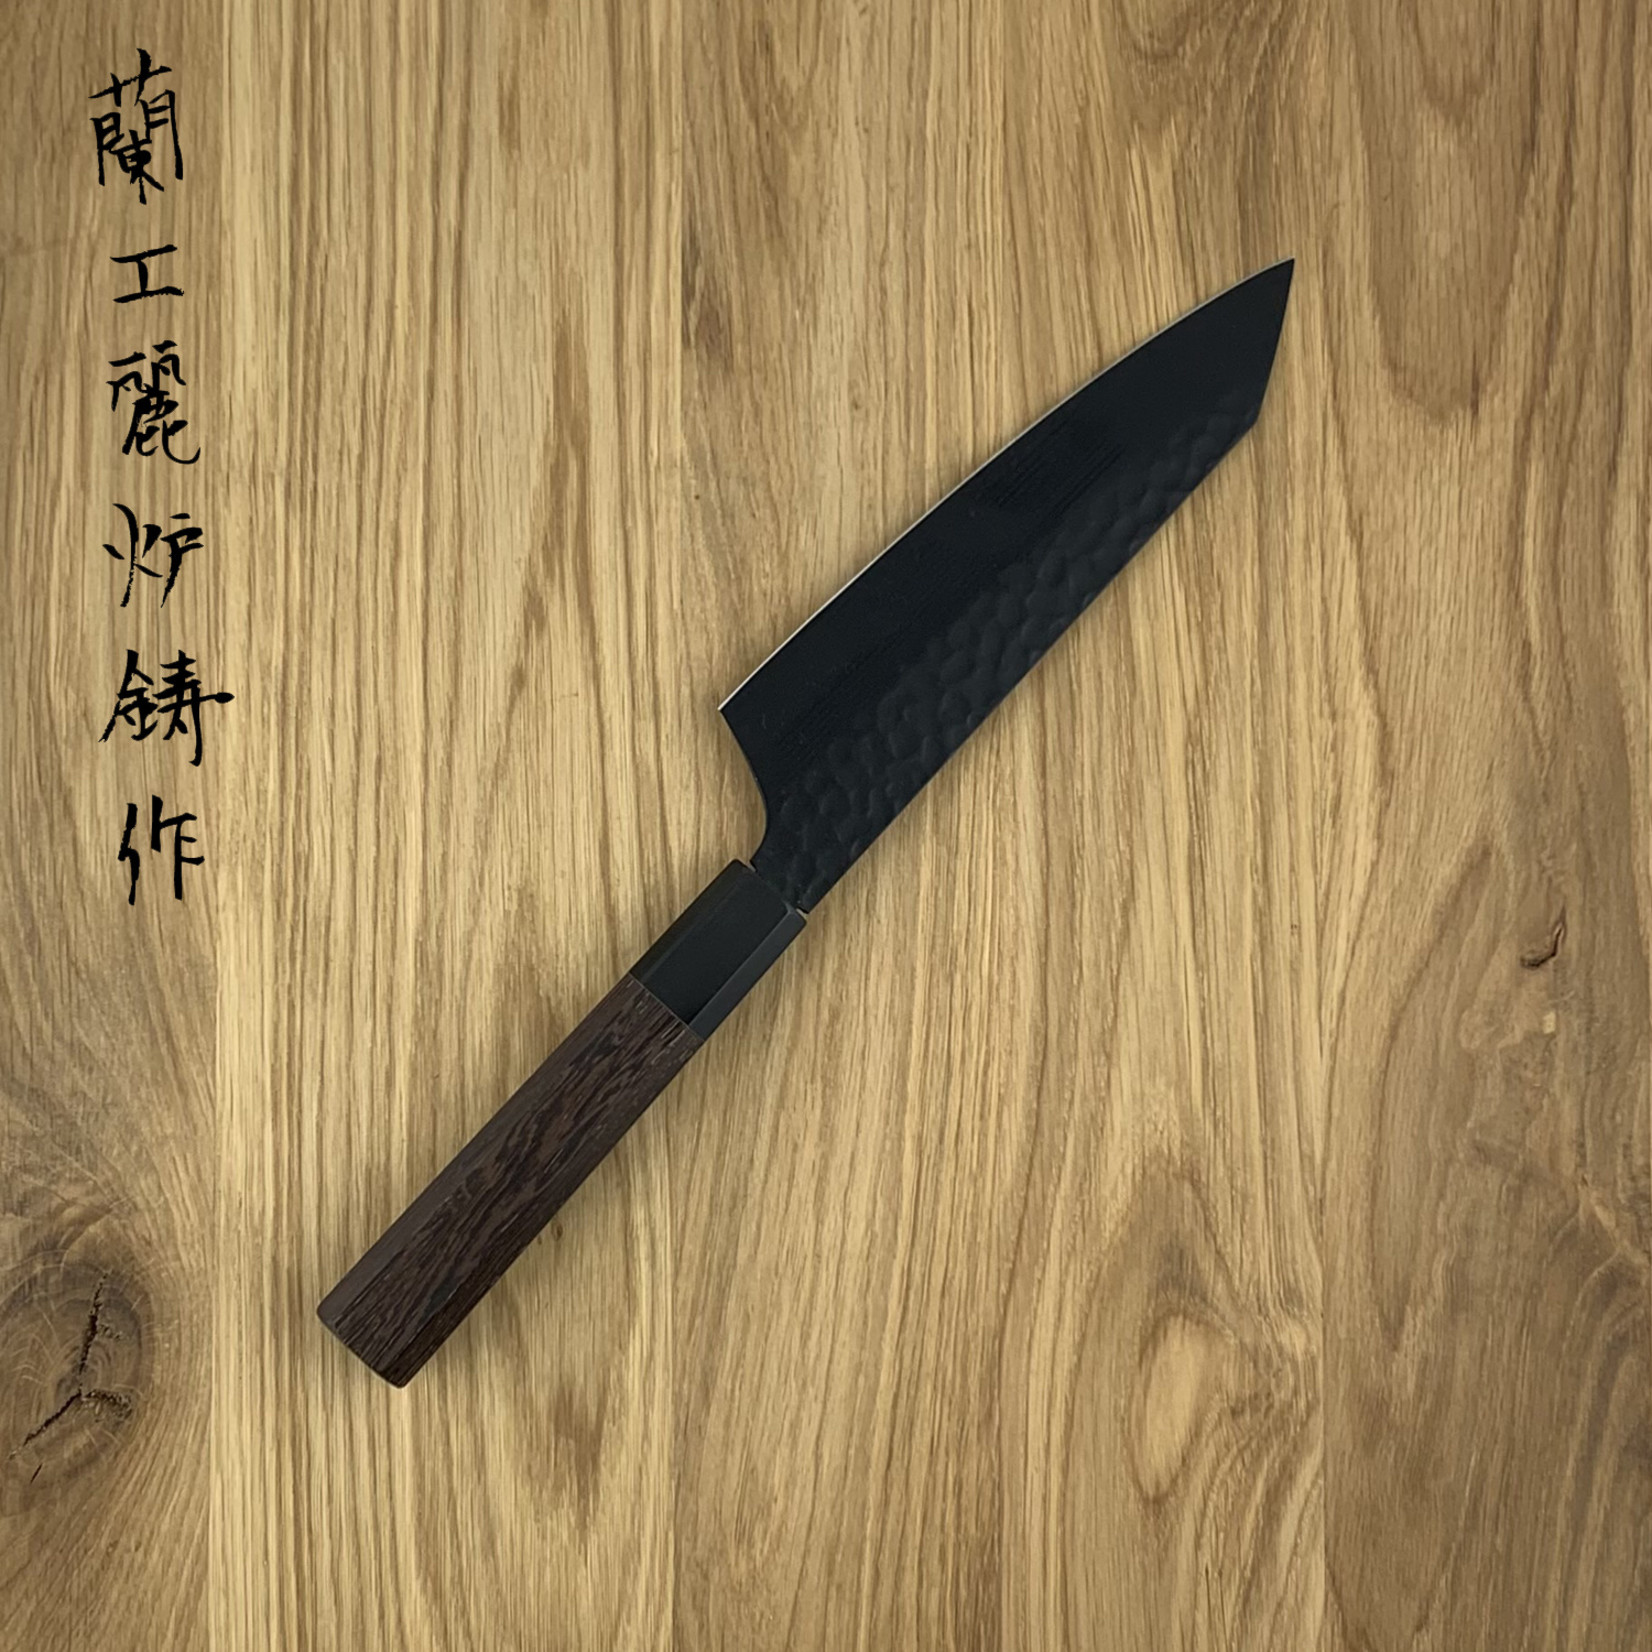 SAKAI TAKAYUKI Kurokage Kengata 160 mm 07495